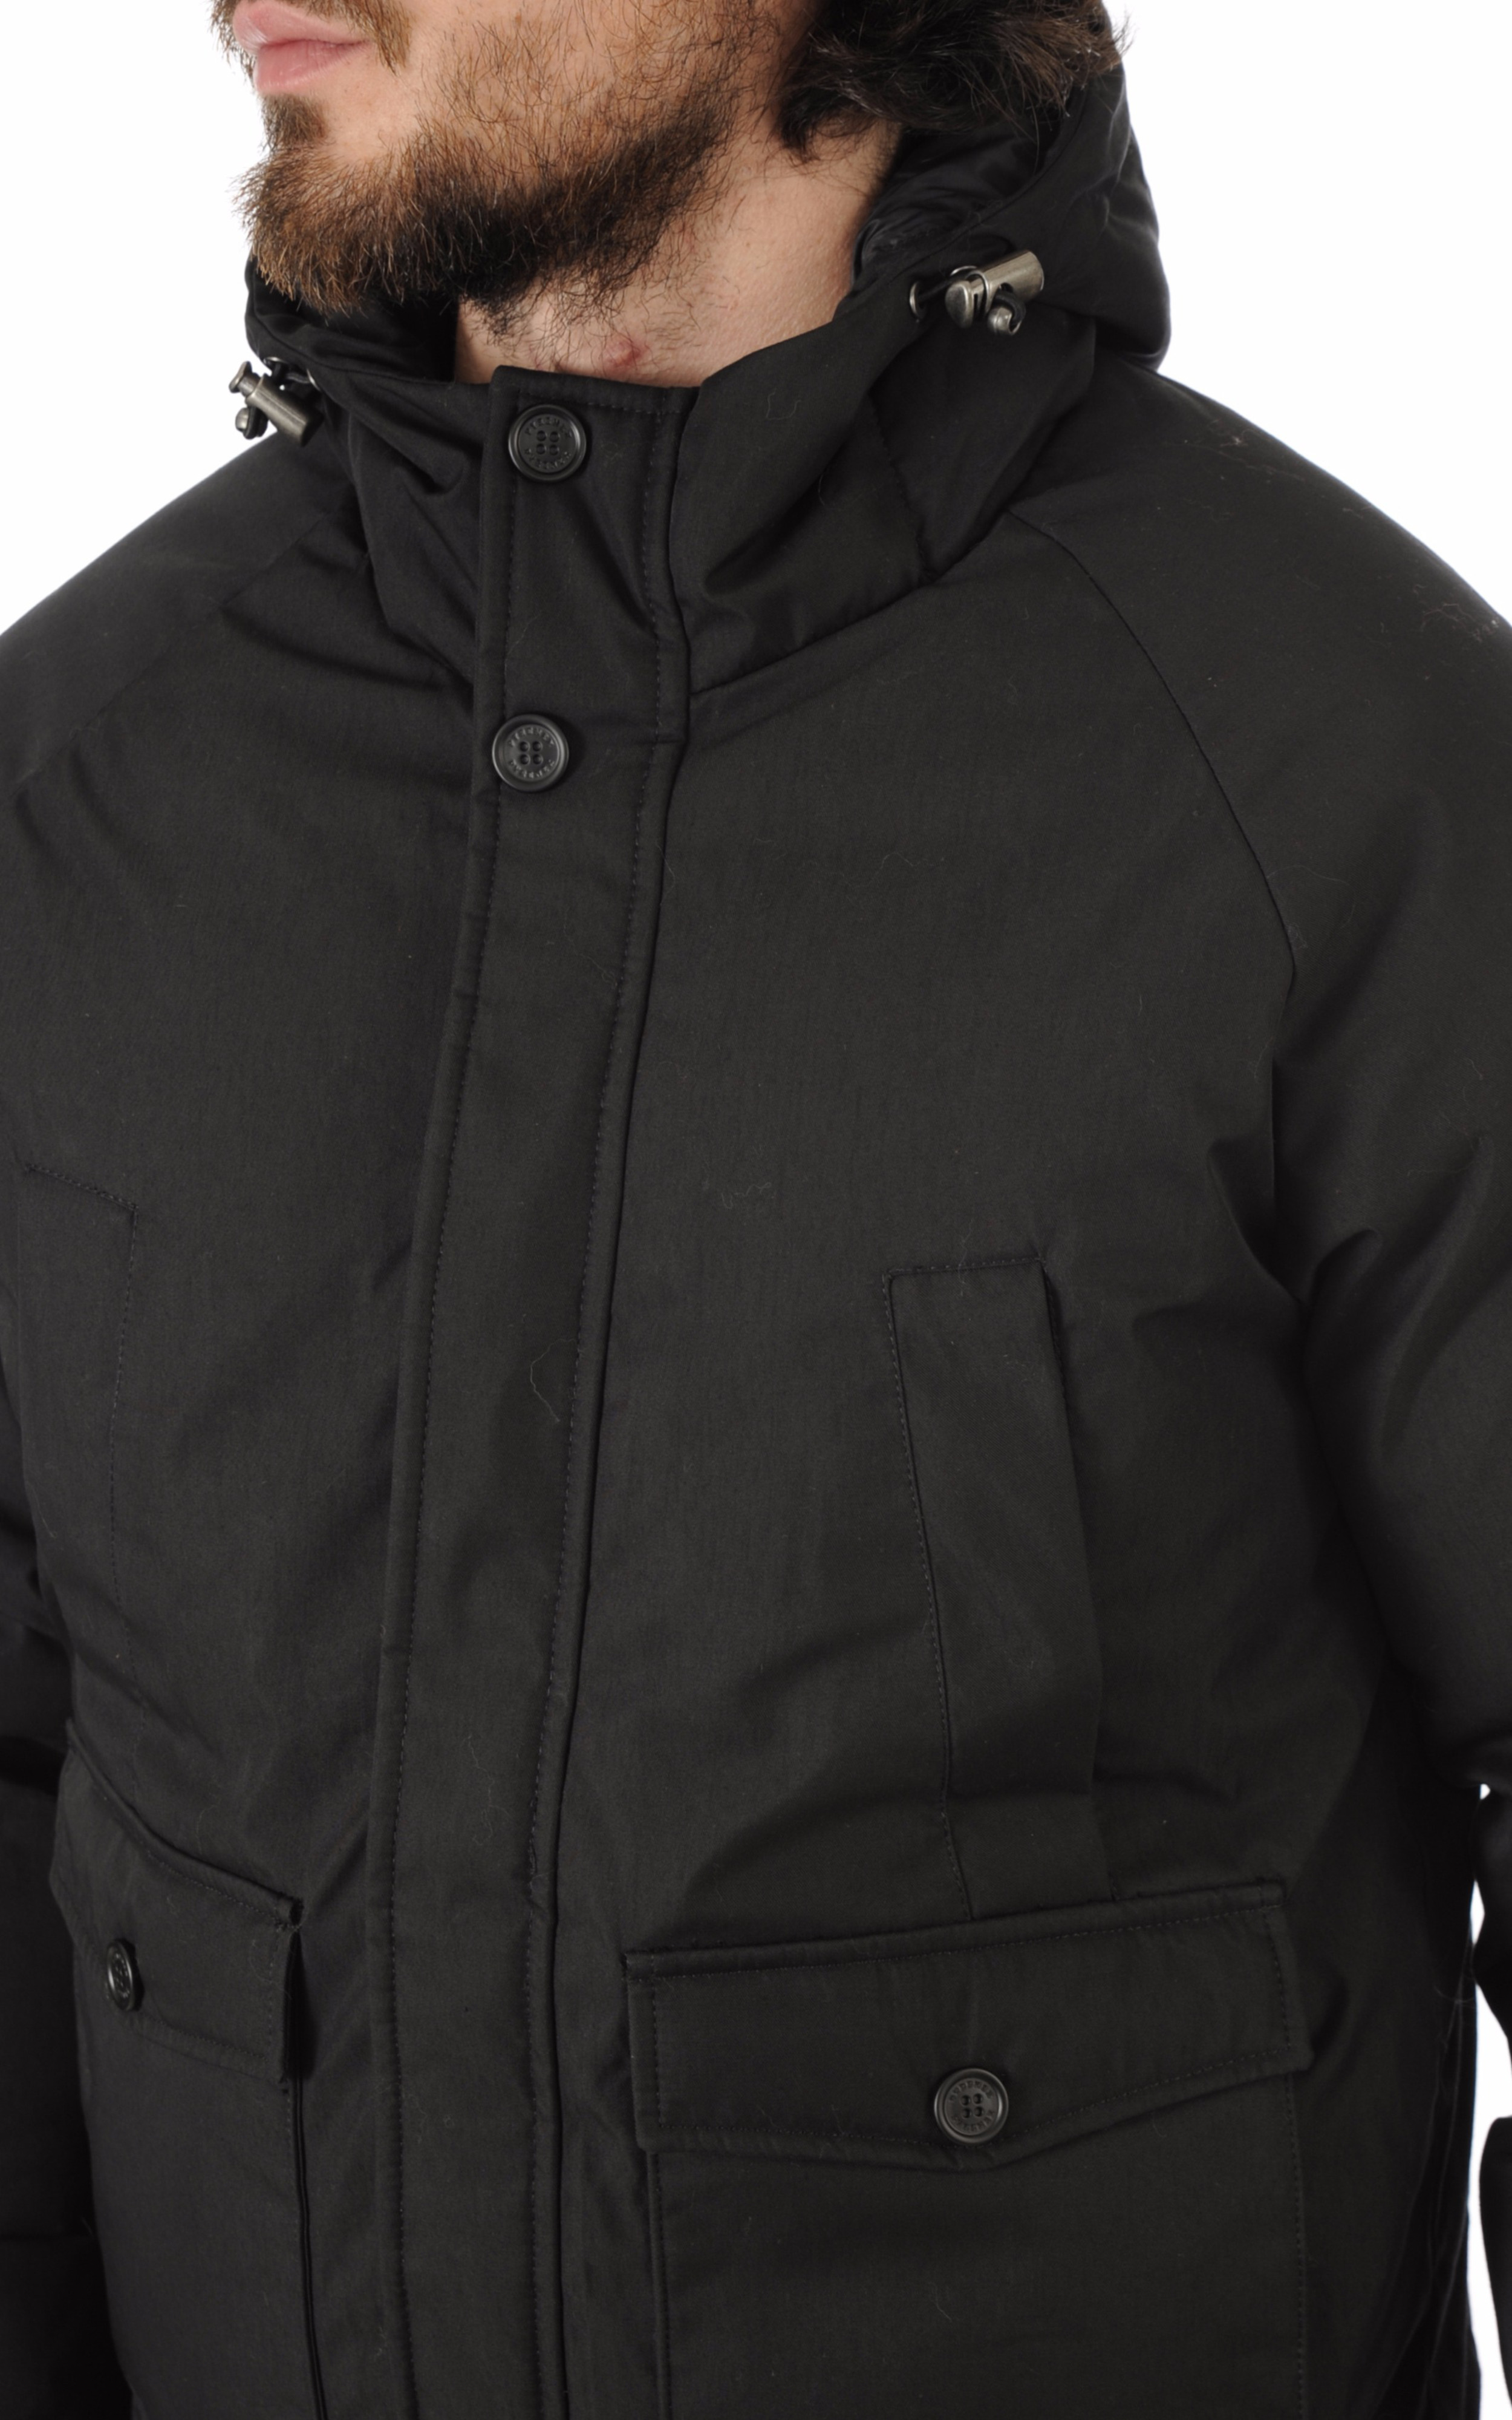 Blouson Mistral noir Pyrenex